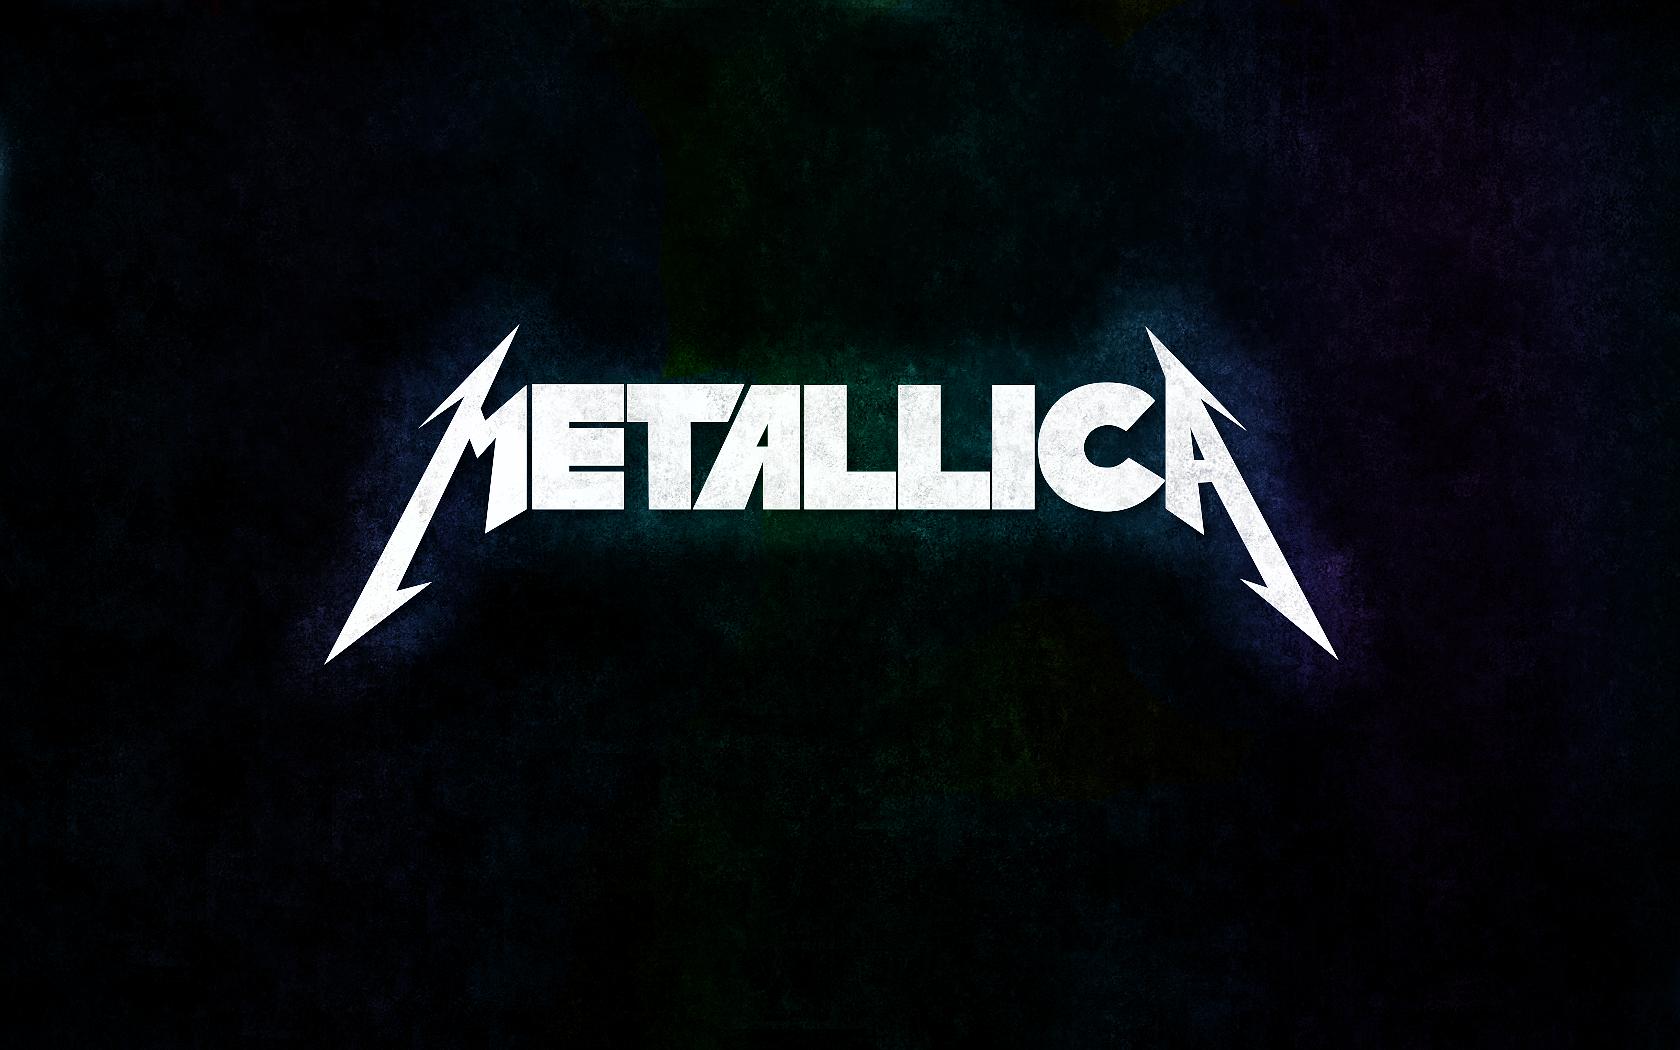 Metallica Logo Images HD Wallpaper Desktop